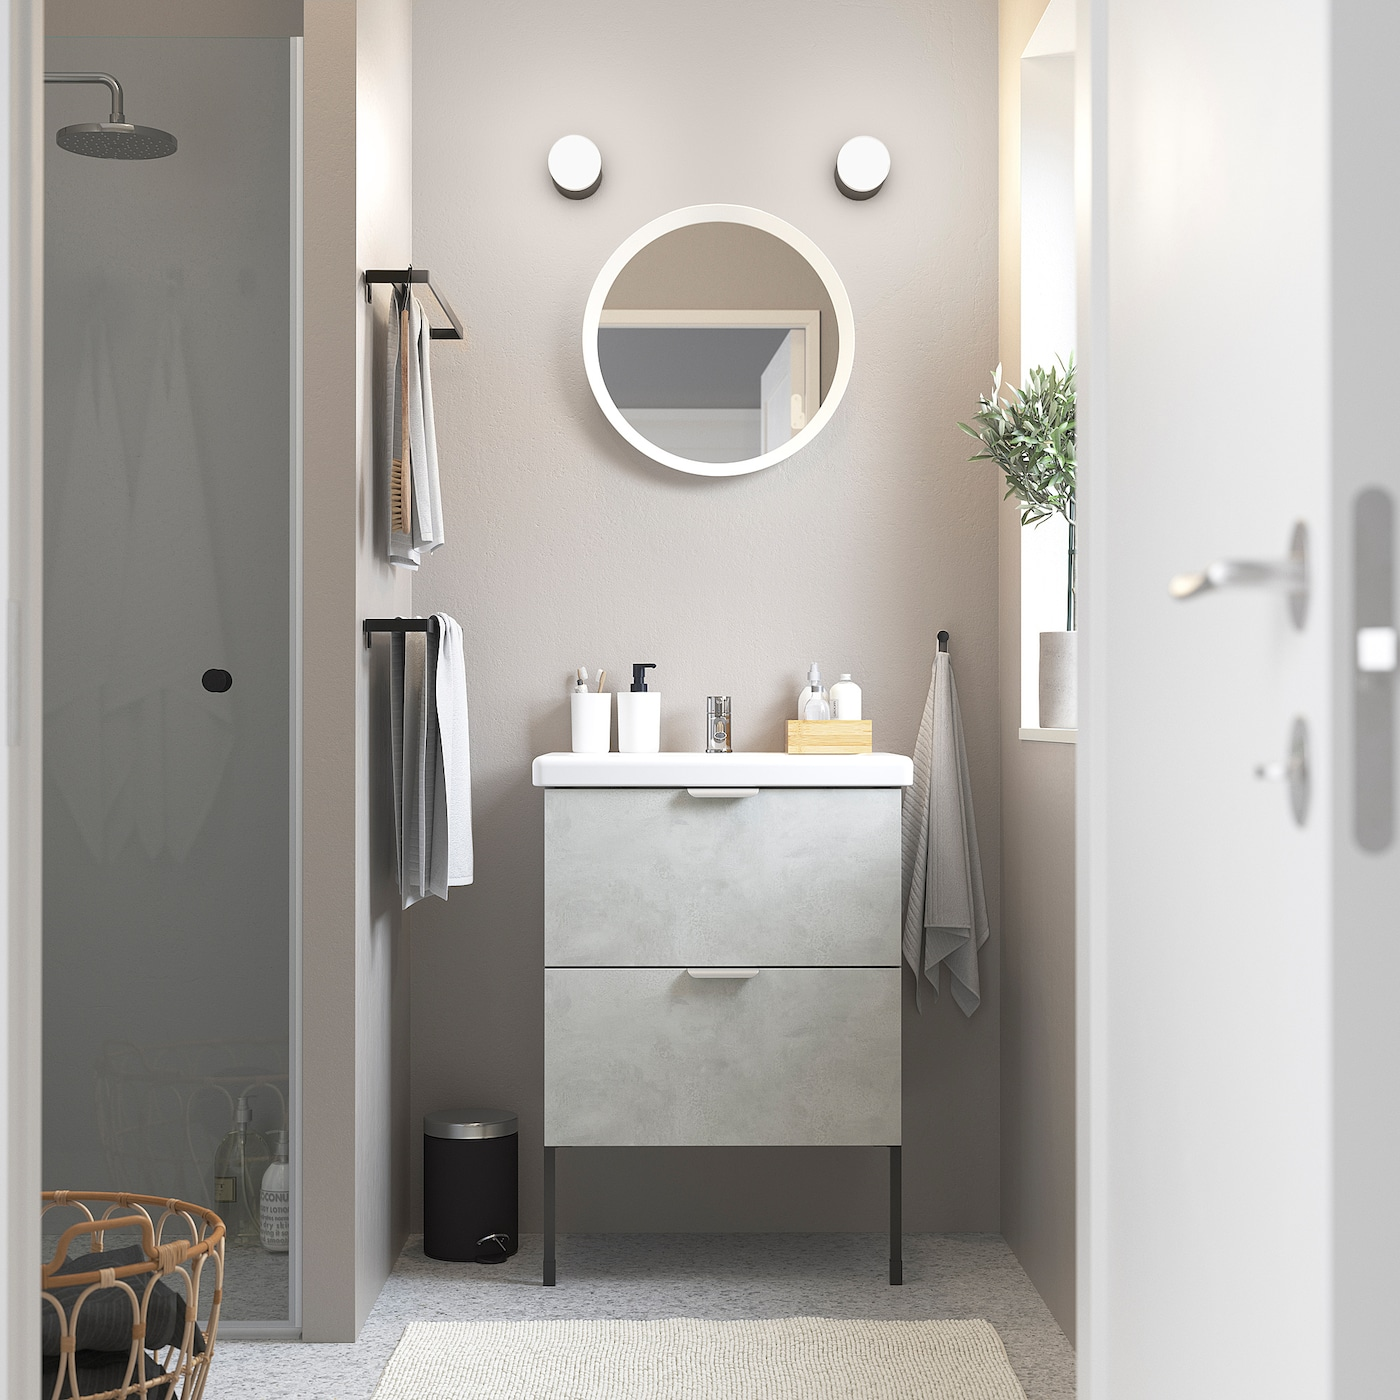 ENHET / TVÄLLEN Wash-stand with 2 drawers, concrete effect/grey Pilkån tap, 64x43x87 cm